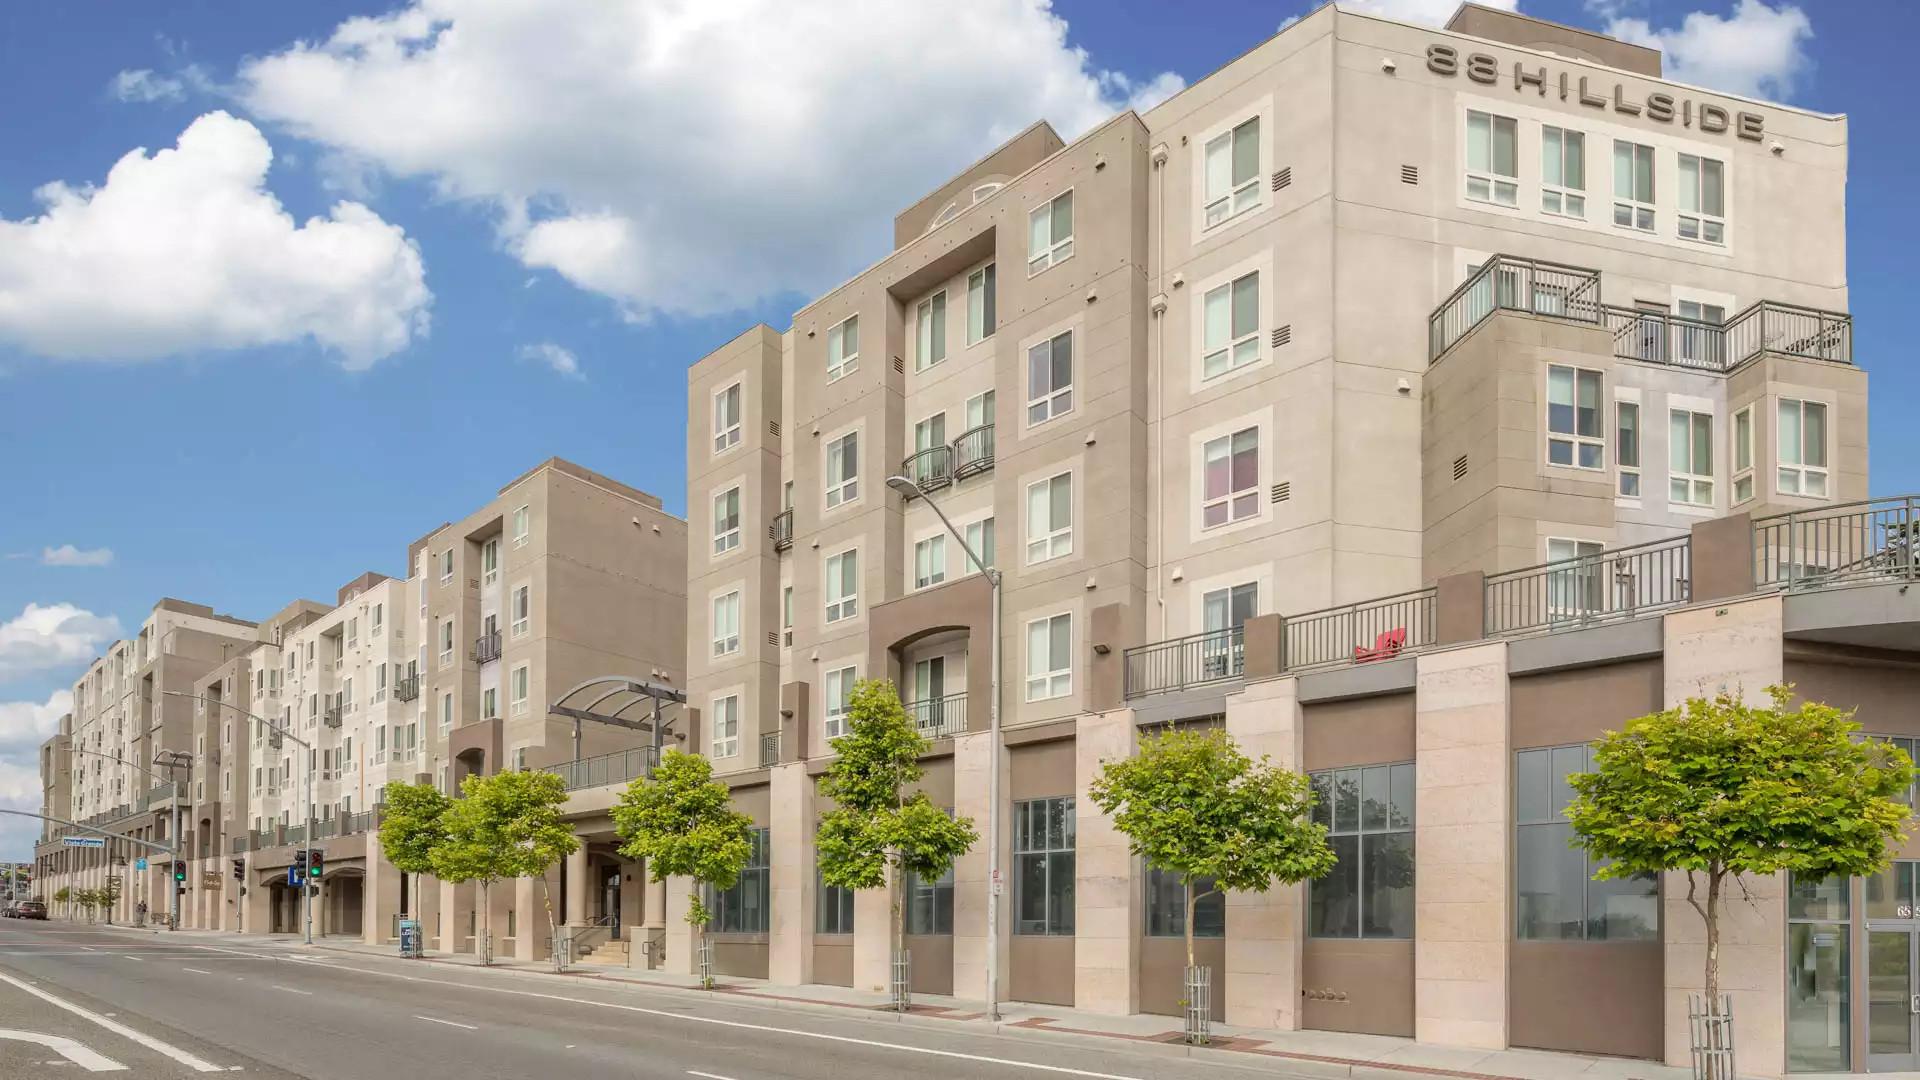 88 Hillside Apartments - Daly City, CA